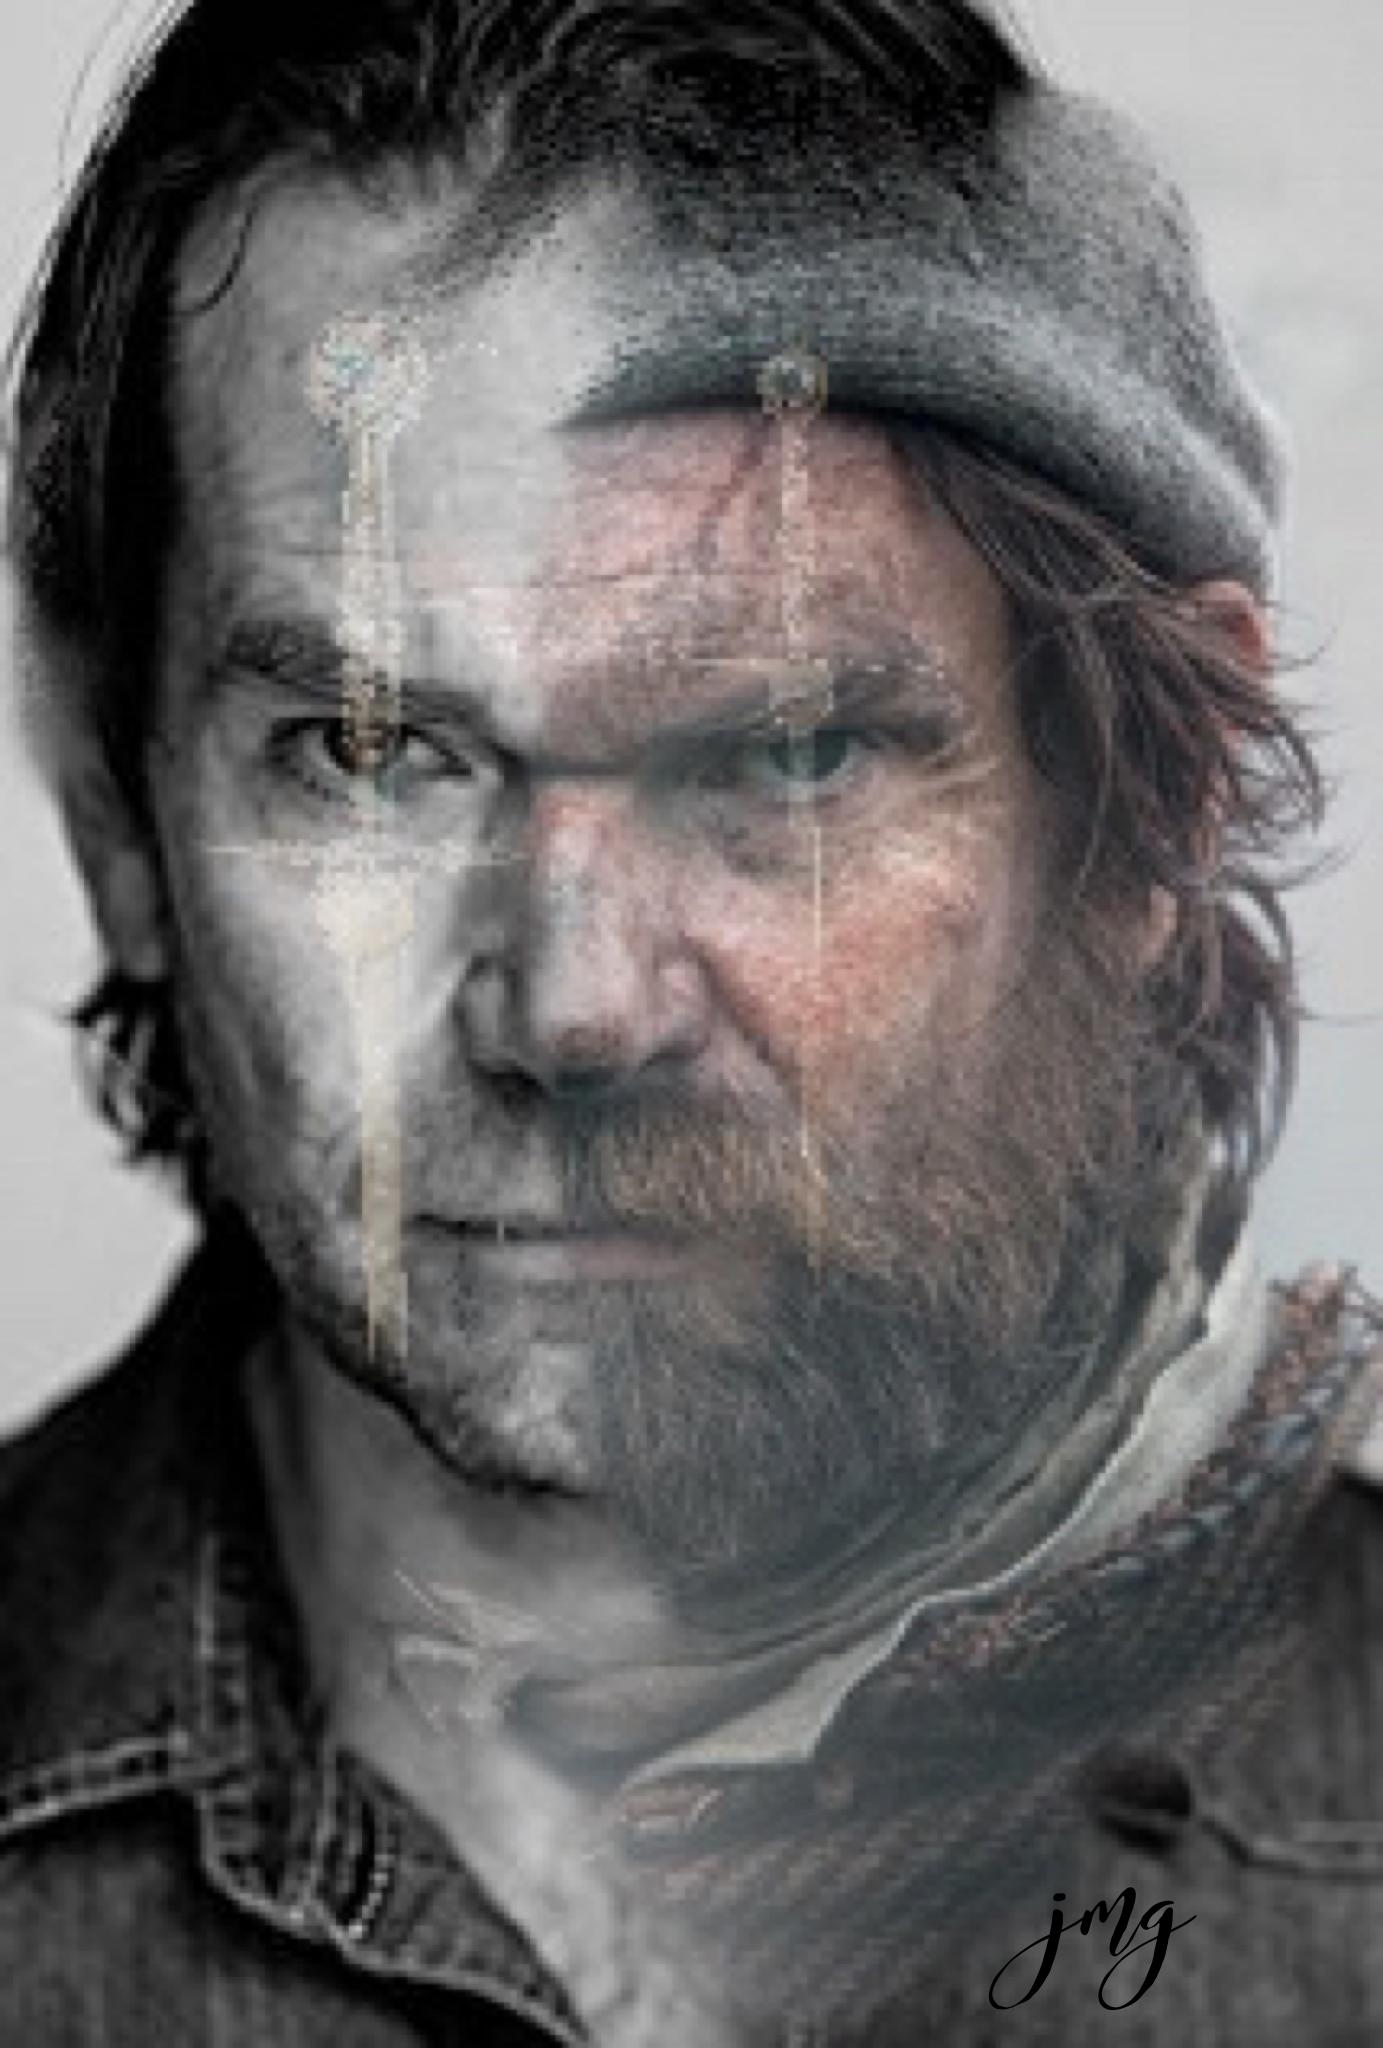 #Outlander #JamieAndClaire #SamHeughan #CaitrionaBalfe #ClanFraser #MyEditsJMG